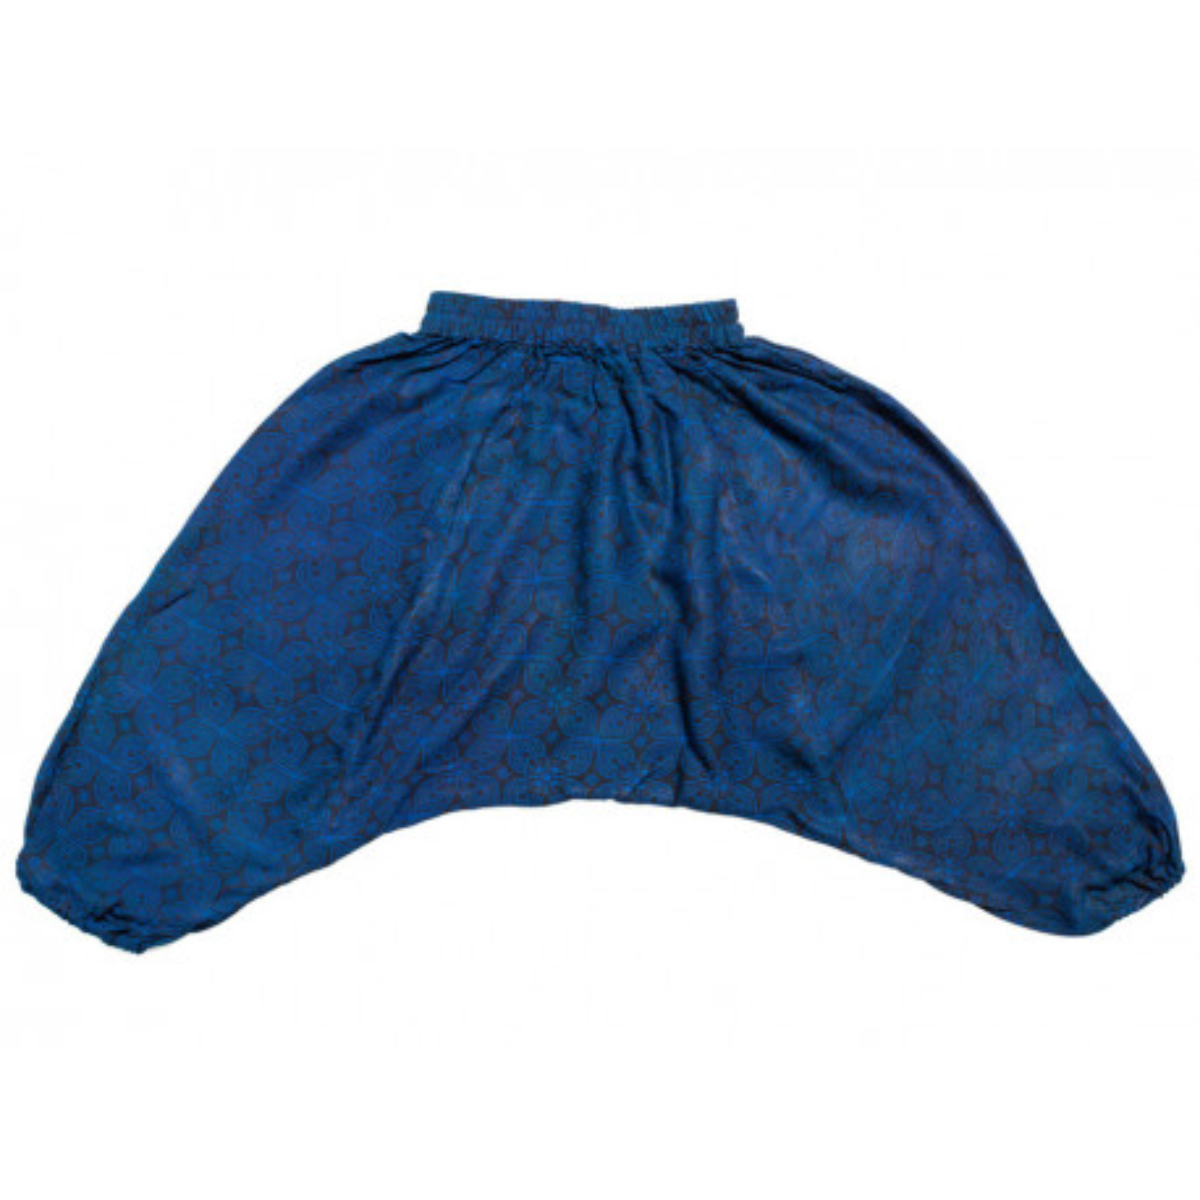 pantalon-sarouel-leger-0-3-ans-bleu-nuit